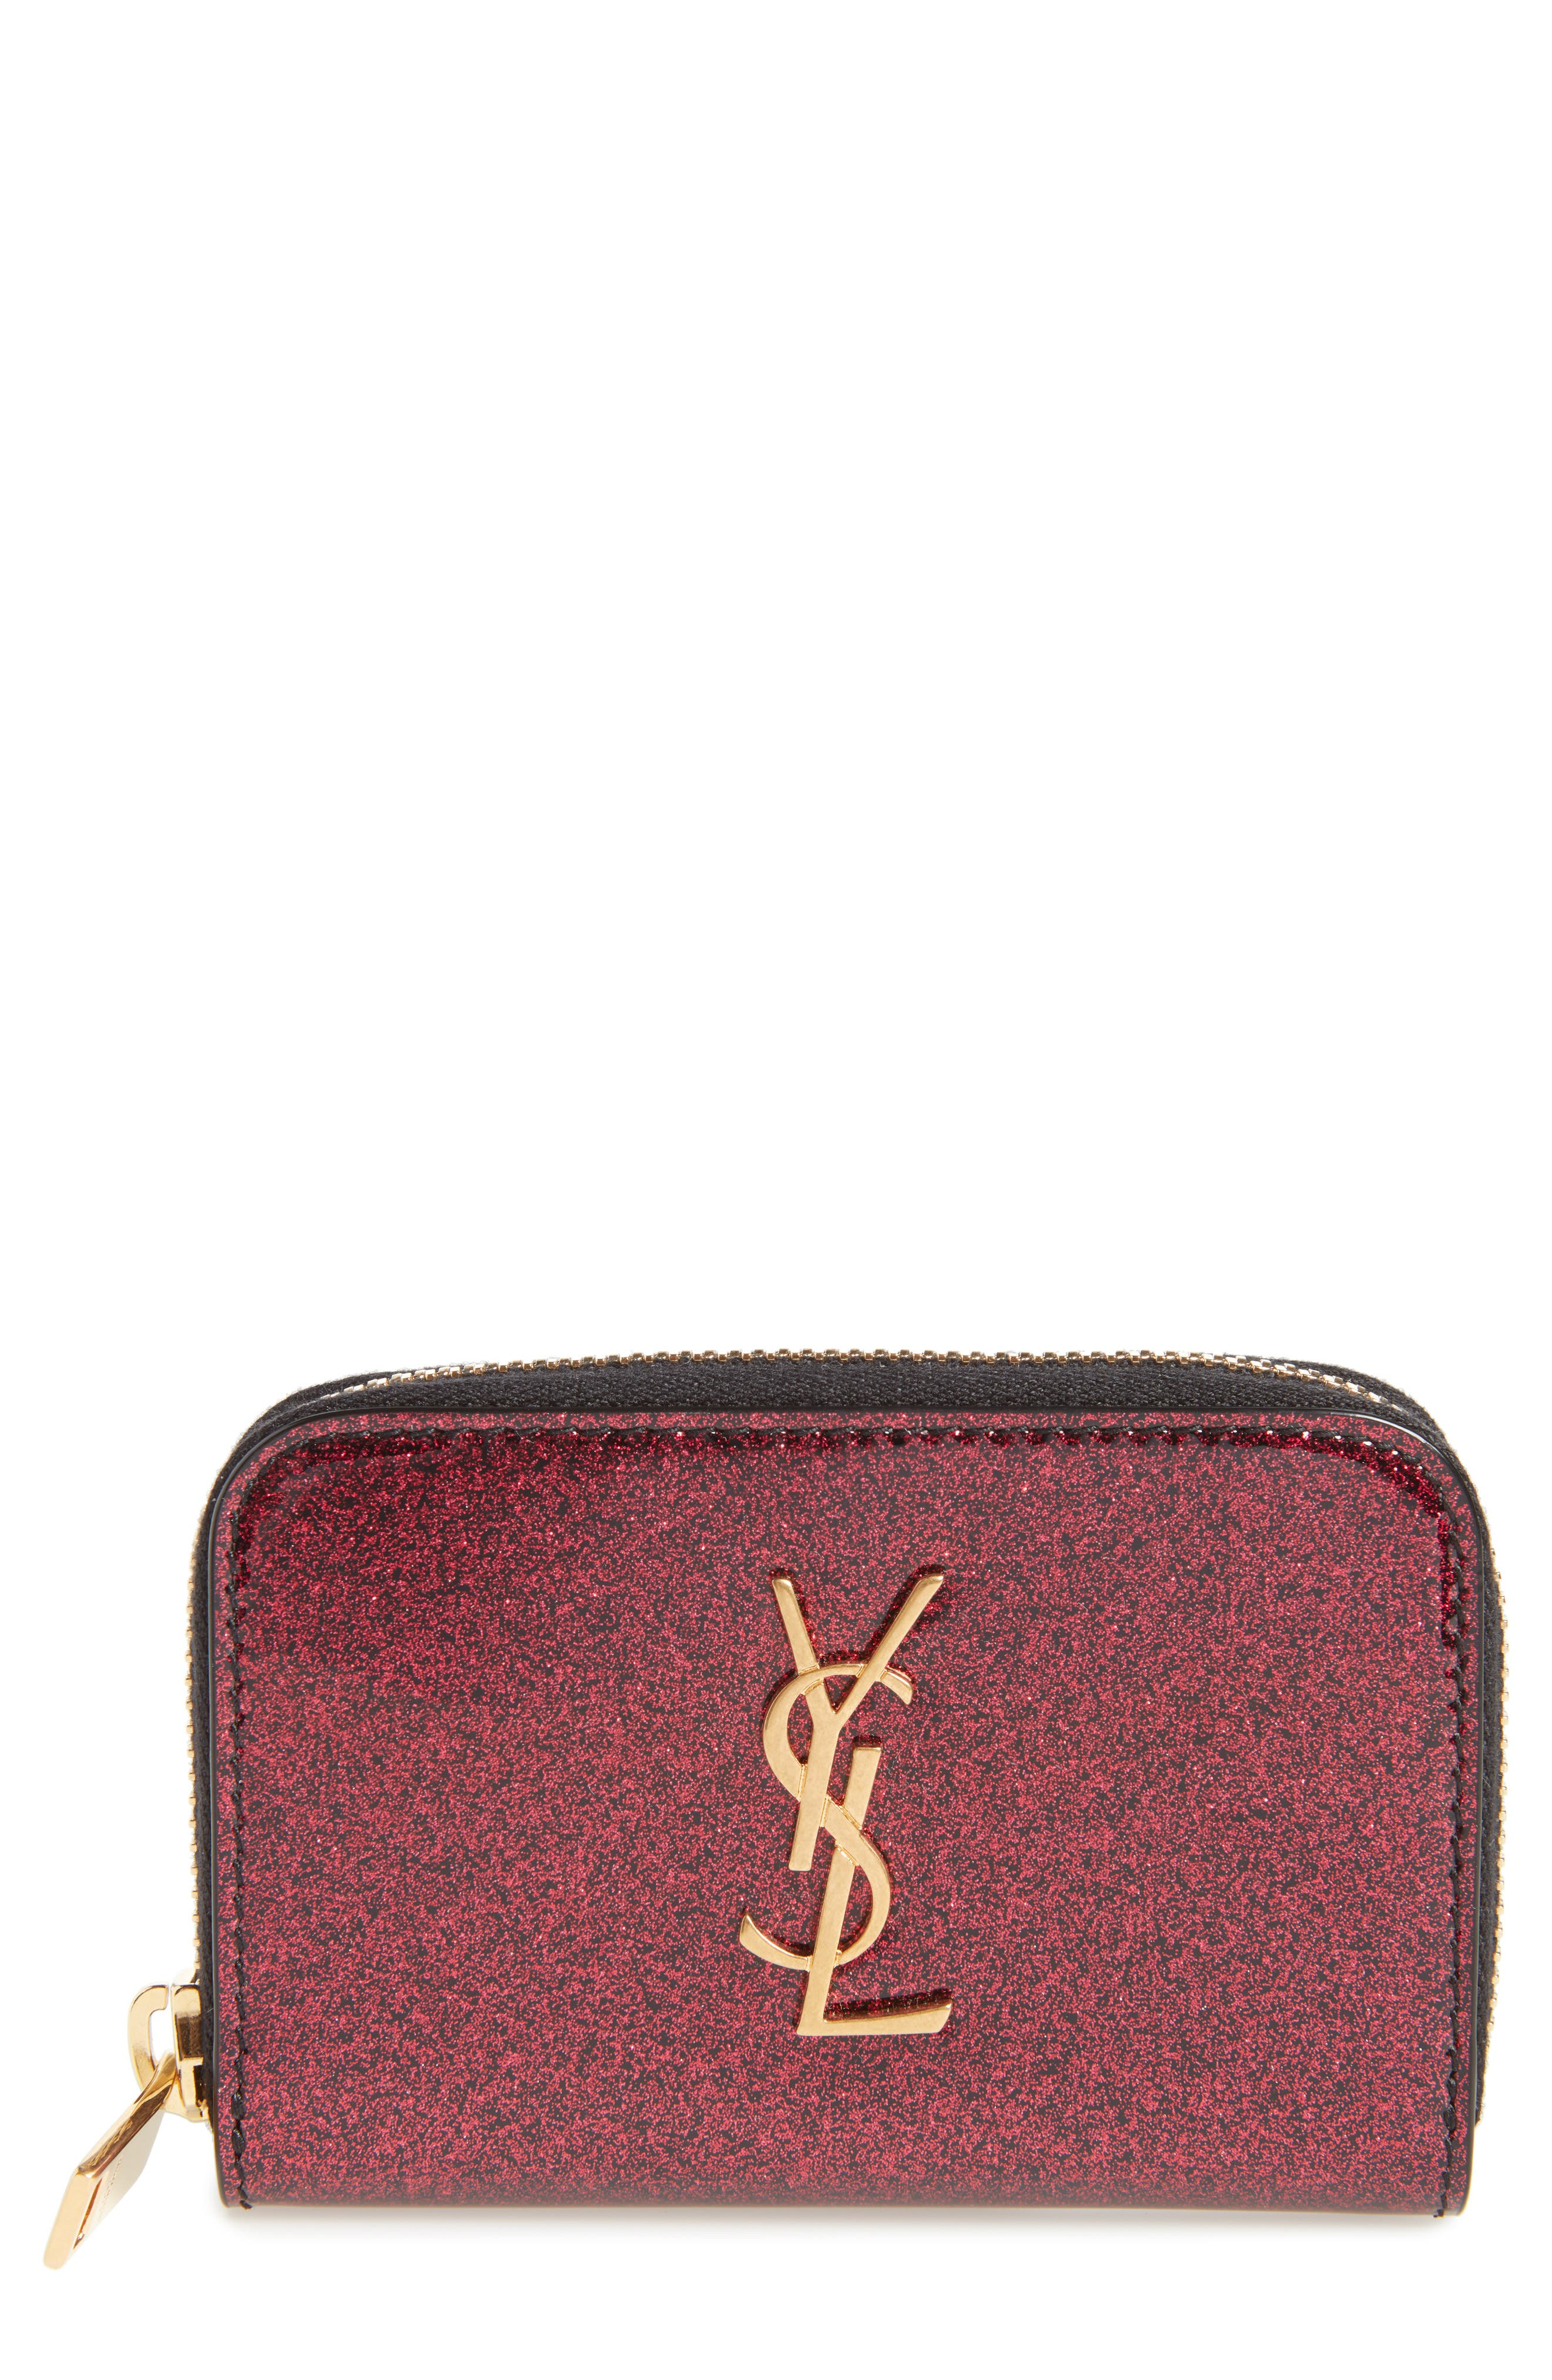 SAINT LAURENT, Glitter Calfskin Leather Wallet, Main thumbnail 1, color, SHOCKING PINK/ NOIR